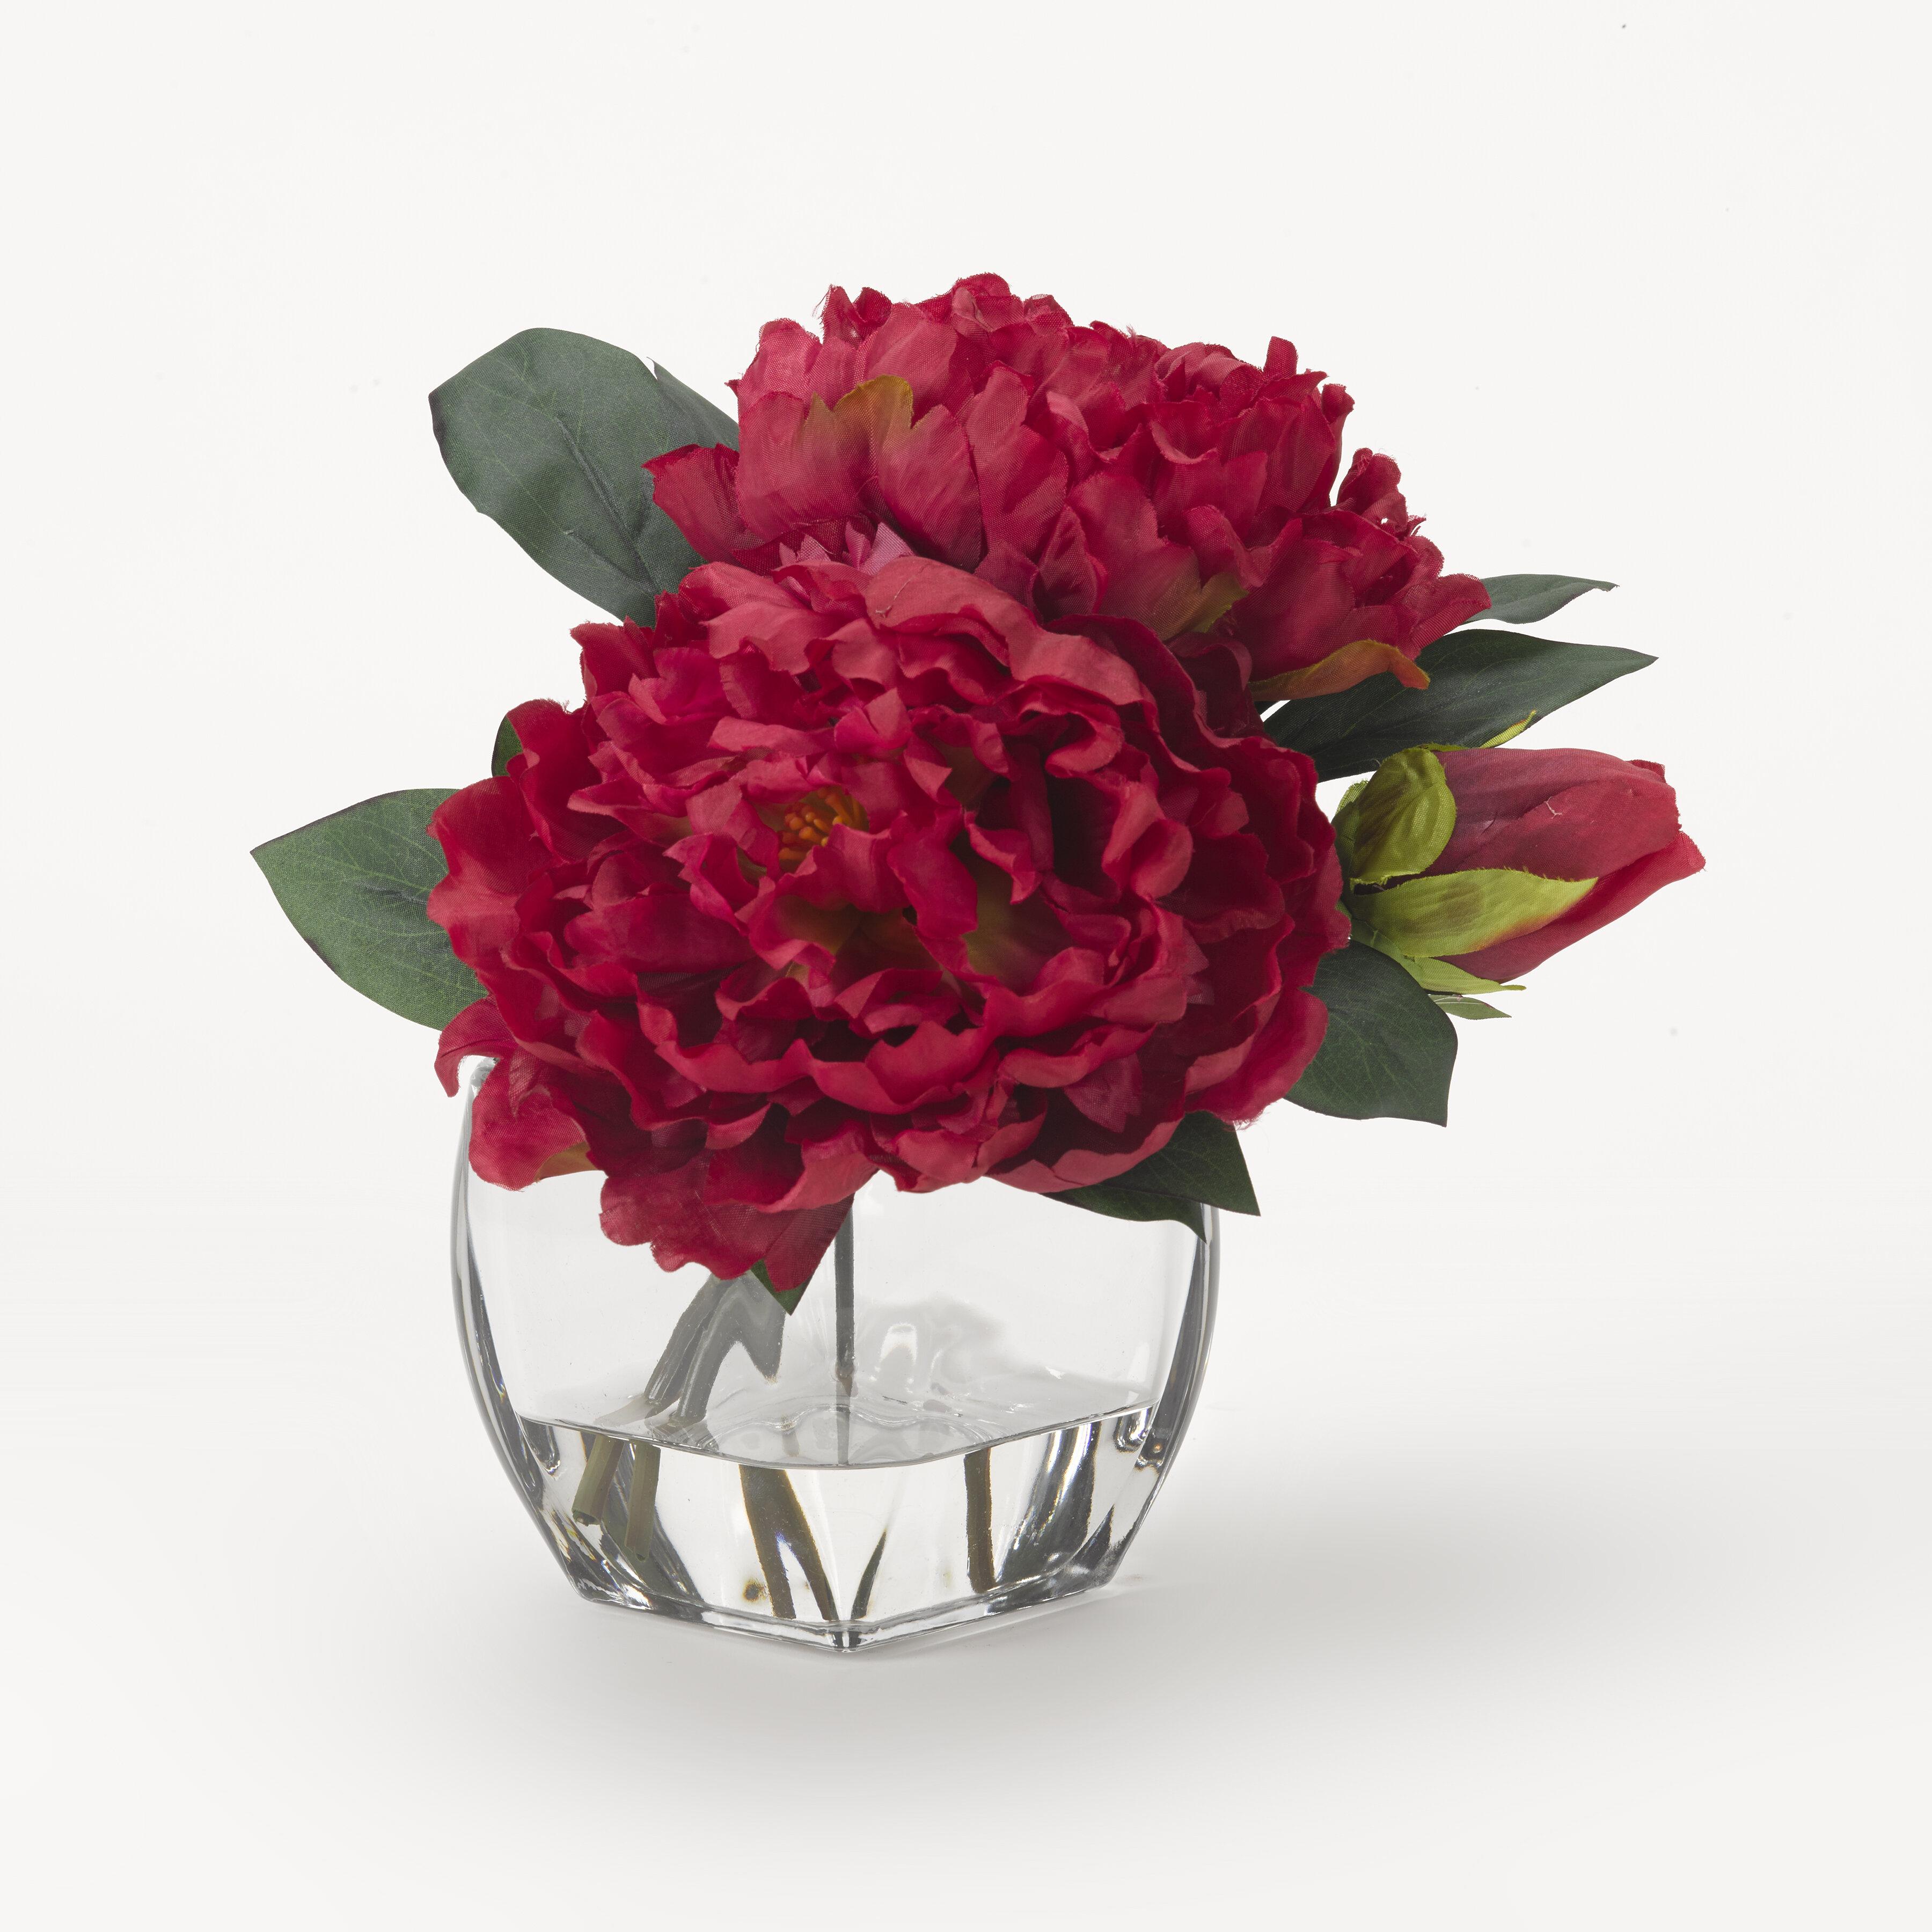 Remarkable Peonies Floral Arrangement And Centerpiece In Jar Interior Design Ideas Clesiryabchikinfo